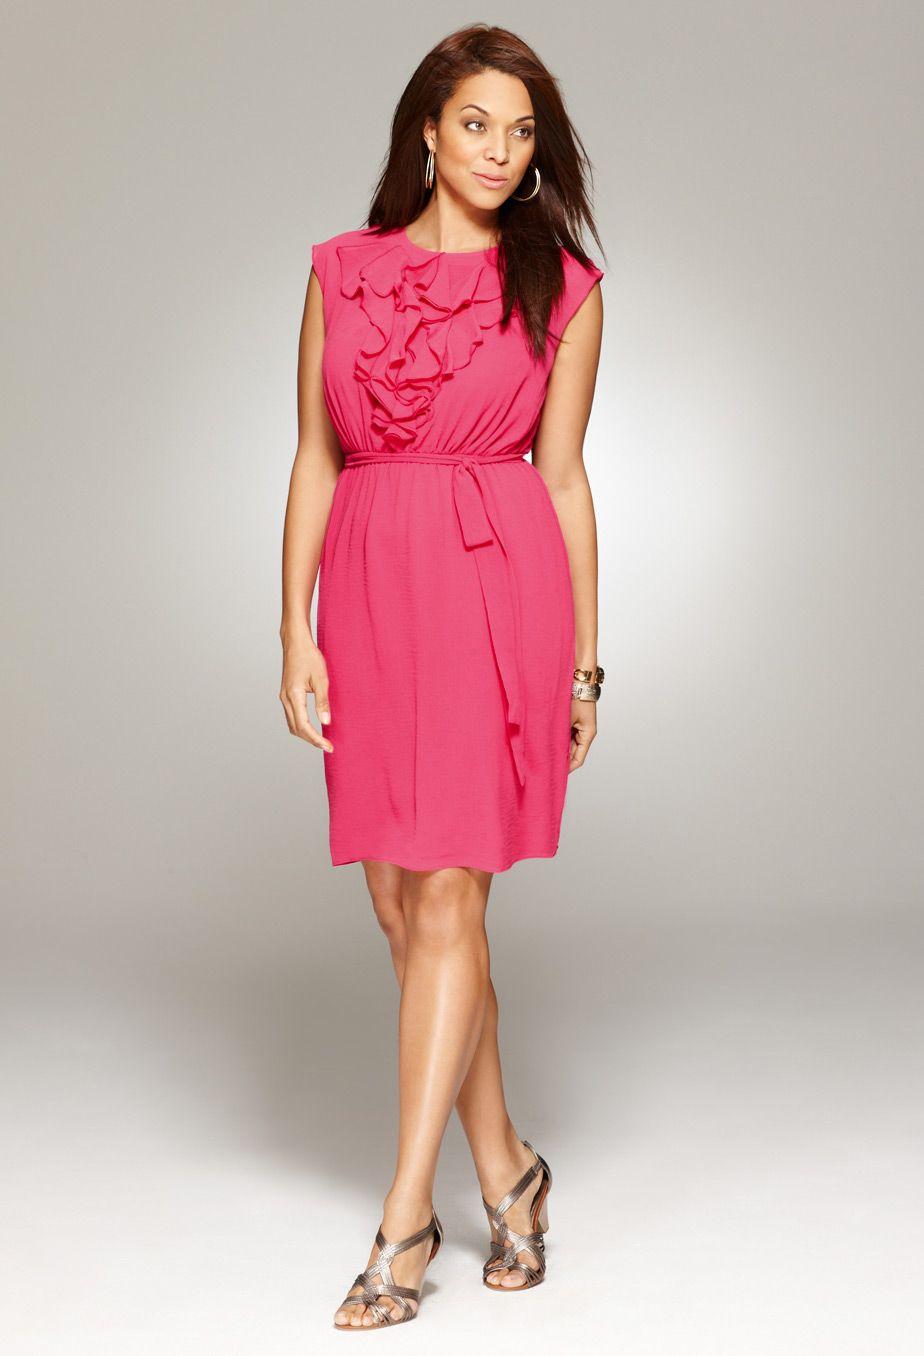 Plus size casual wedding dress  Plus Size Ruffle Front Dress  Plus Size Dress Clearance  Avenue